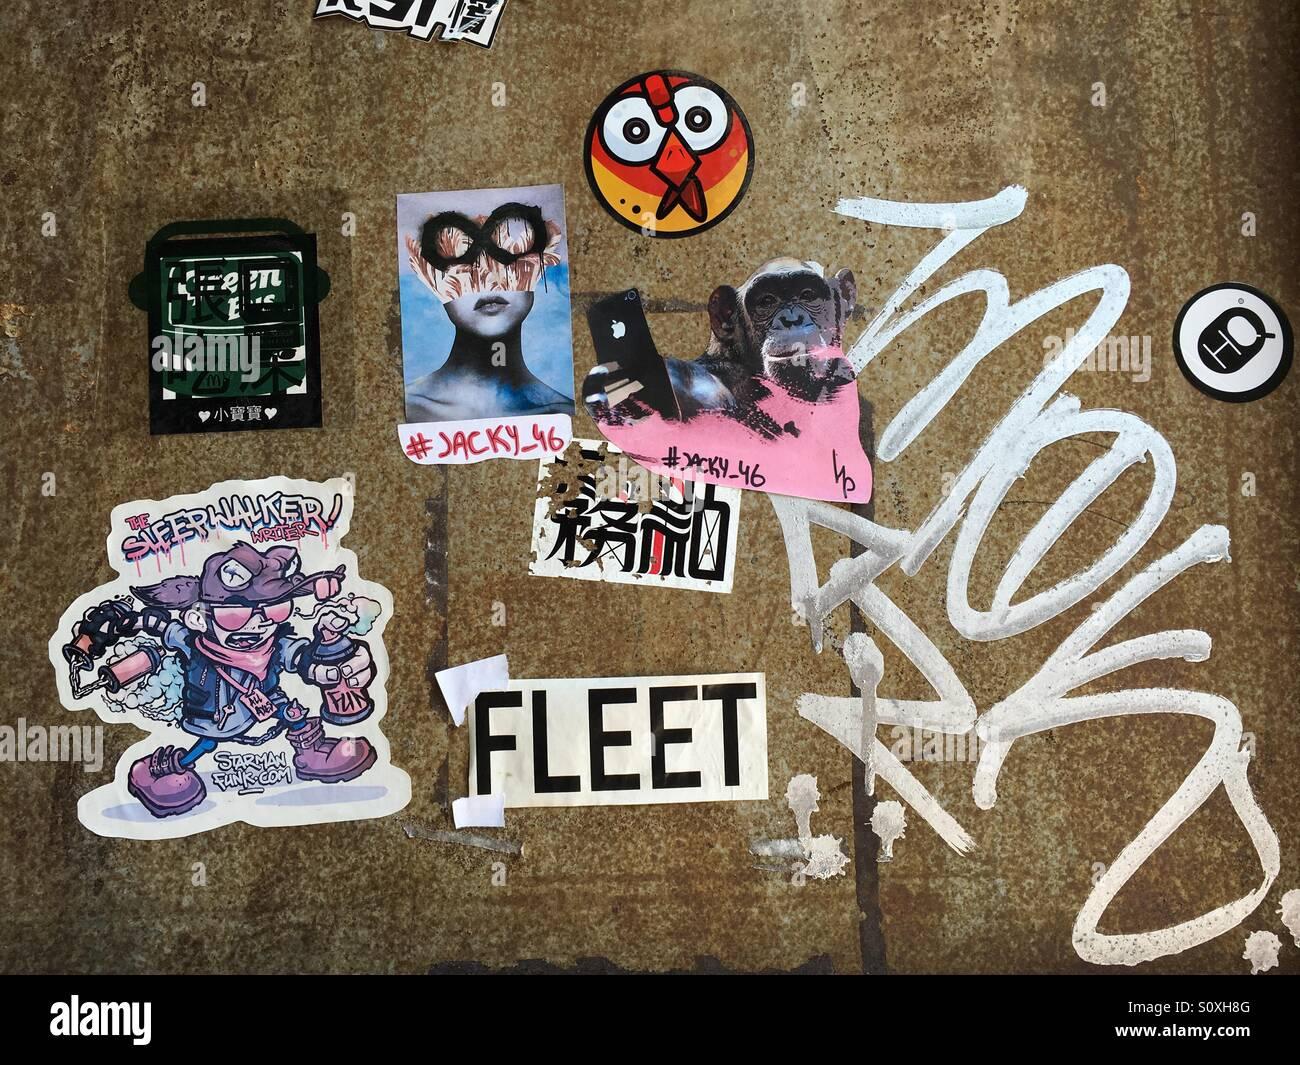 Graffiti Street Art and Stickers in Shenzhen - China - Stock Image